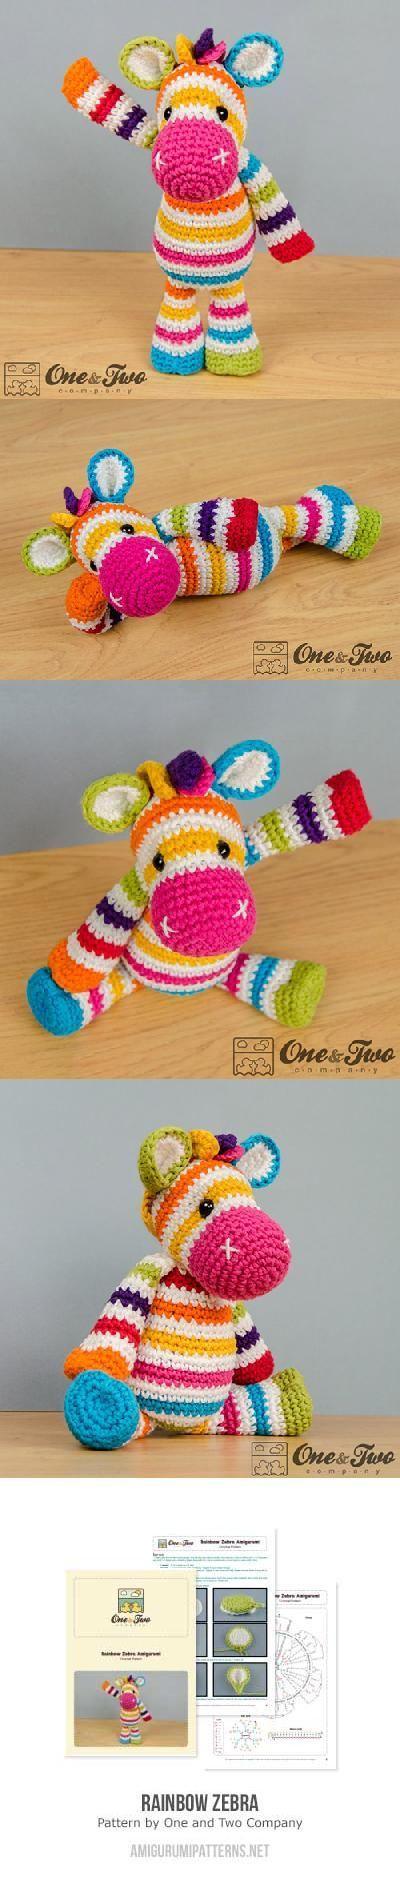 Rainbow zebra amigurumi pattern by One and Two Company | Bunt ...